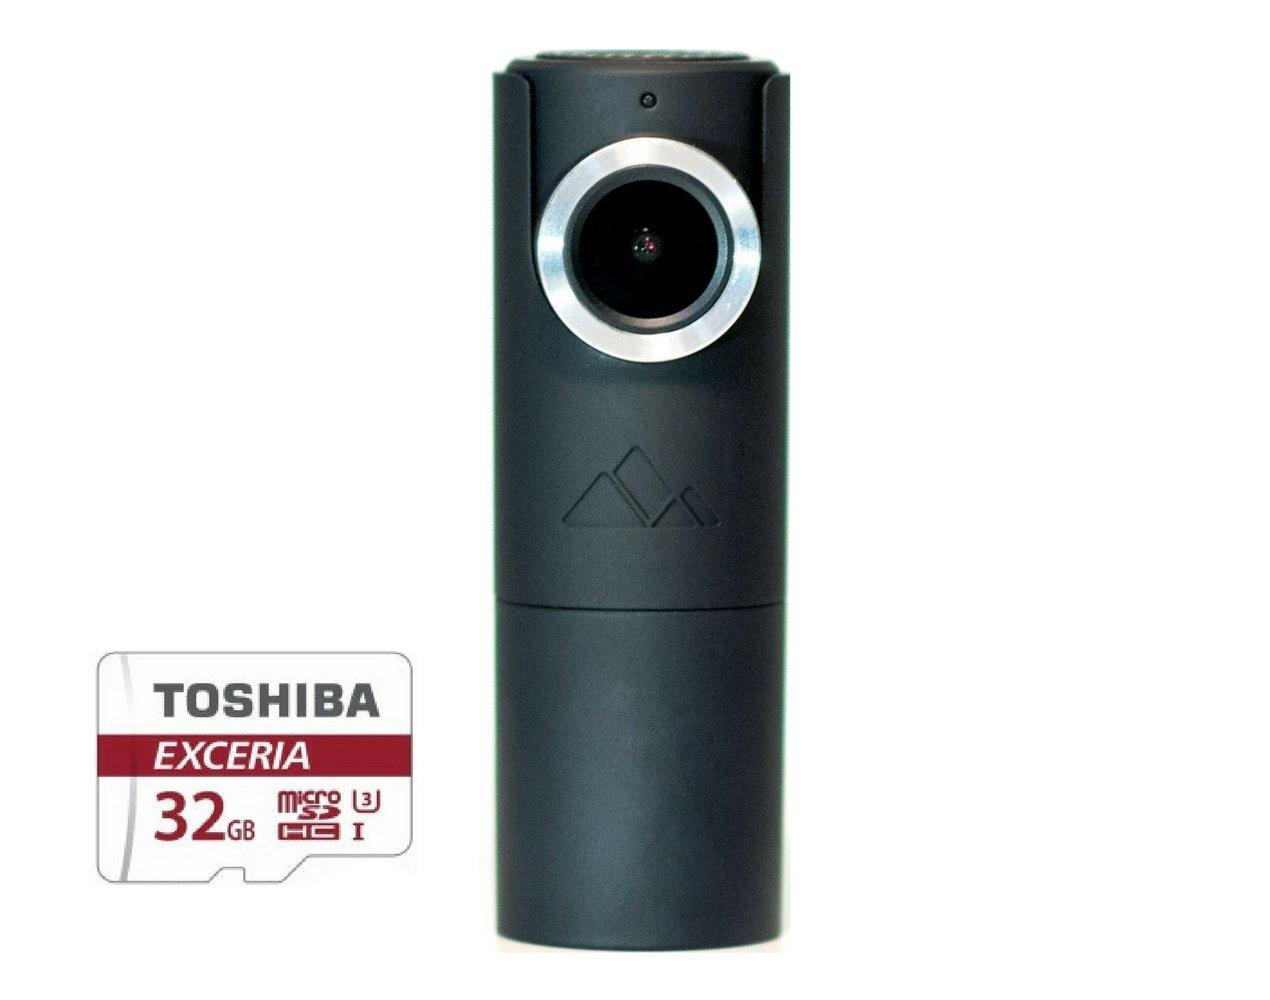 GOLUK T3 in CHARCOAL BLACK compact full HD car dash cam WiFi Full HD 1080P G-sensor Low light vision 32Gb SD card Included